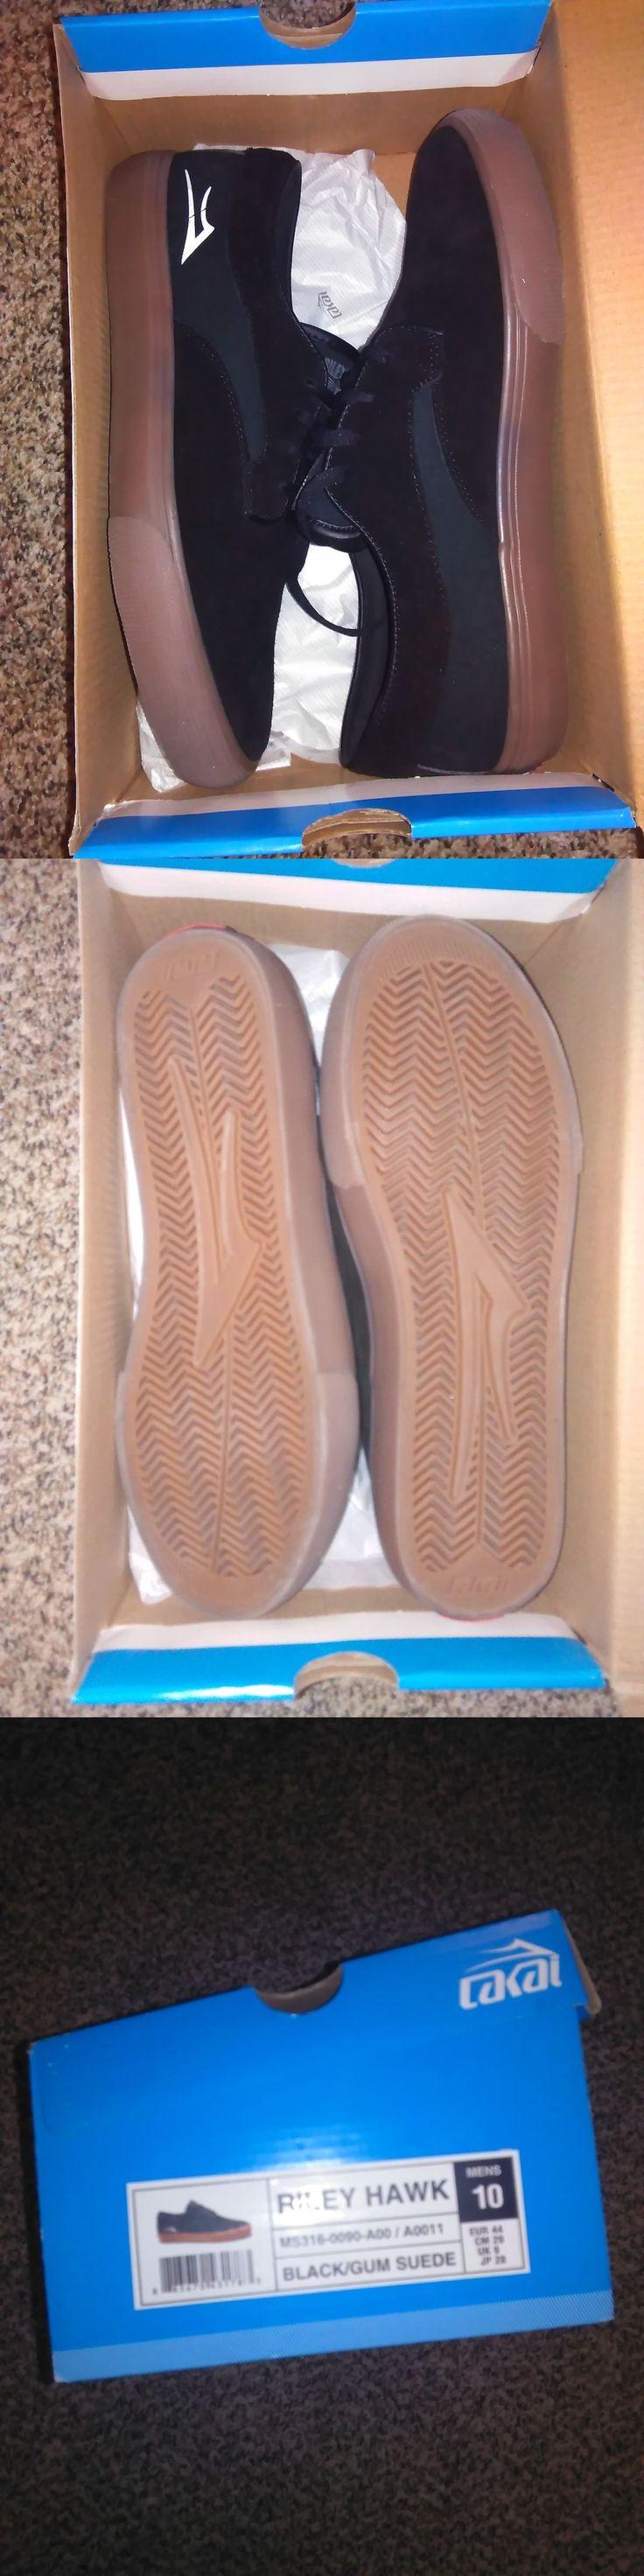 Men 159070: Lakai Riley Hawk Skateboard Shoes Black/Gum Size 10 BUY IT NOW ONLY: $31.5